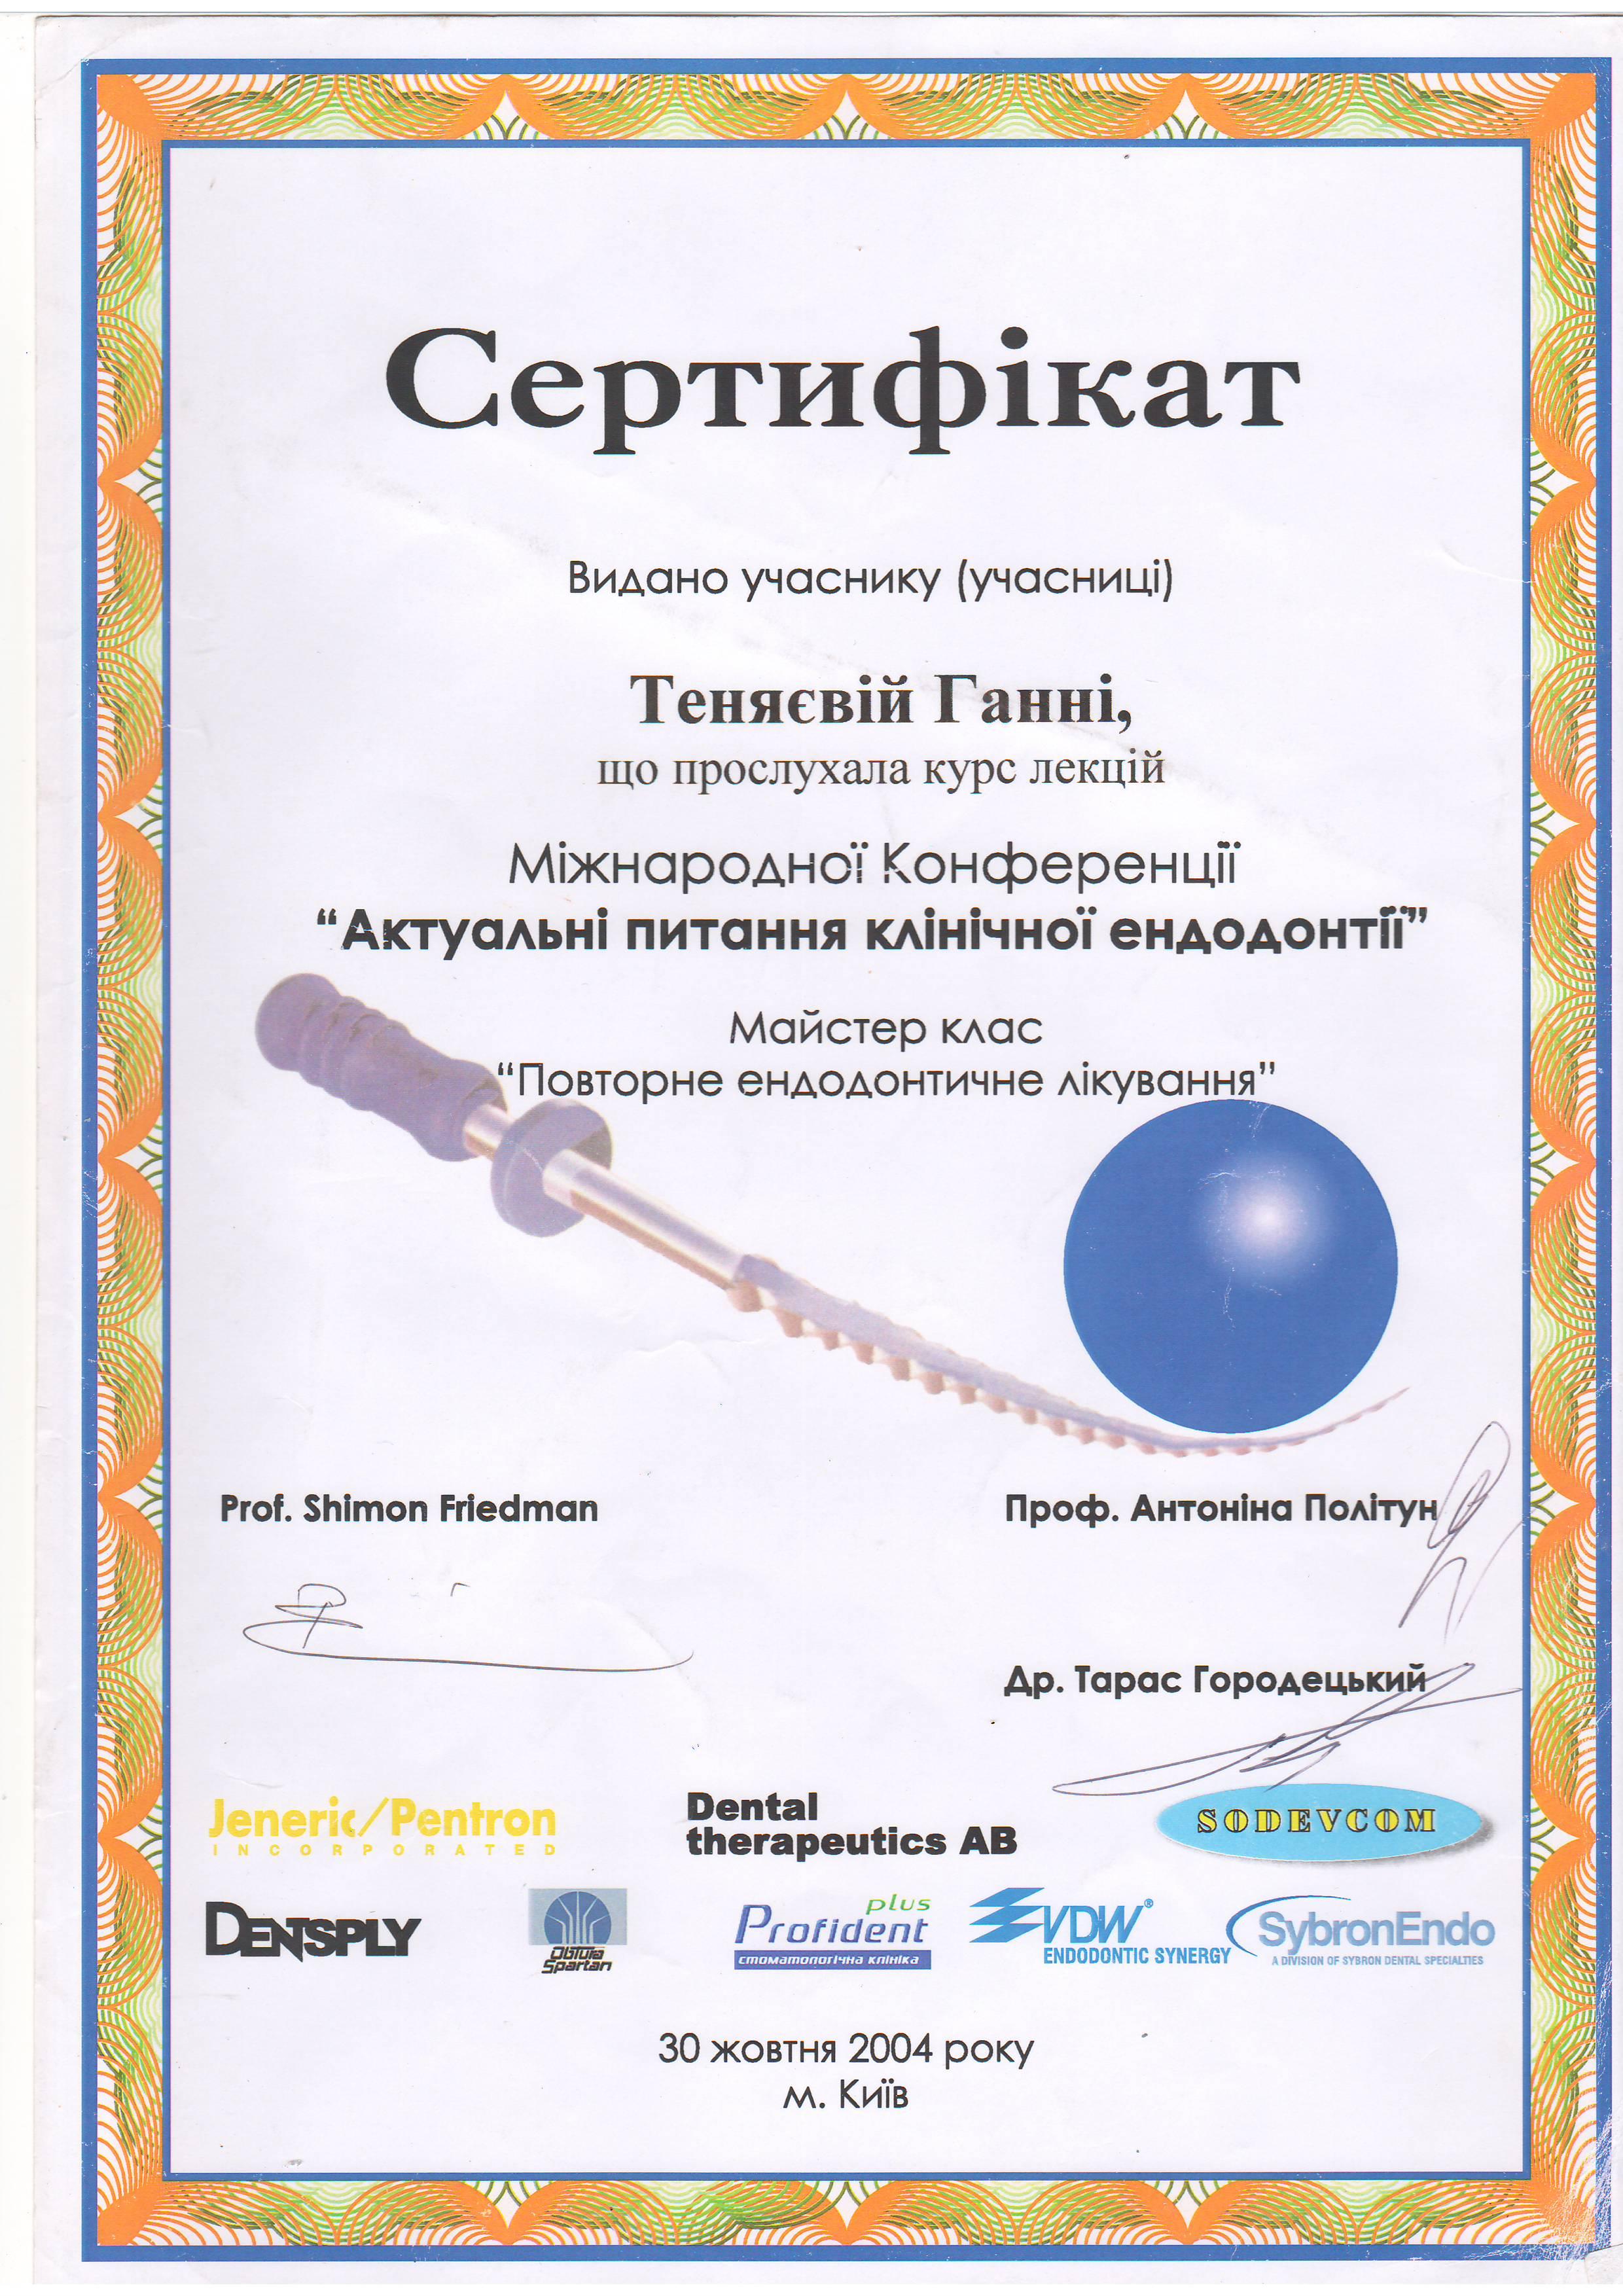 Сертификат 55